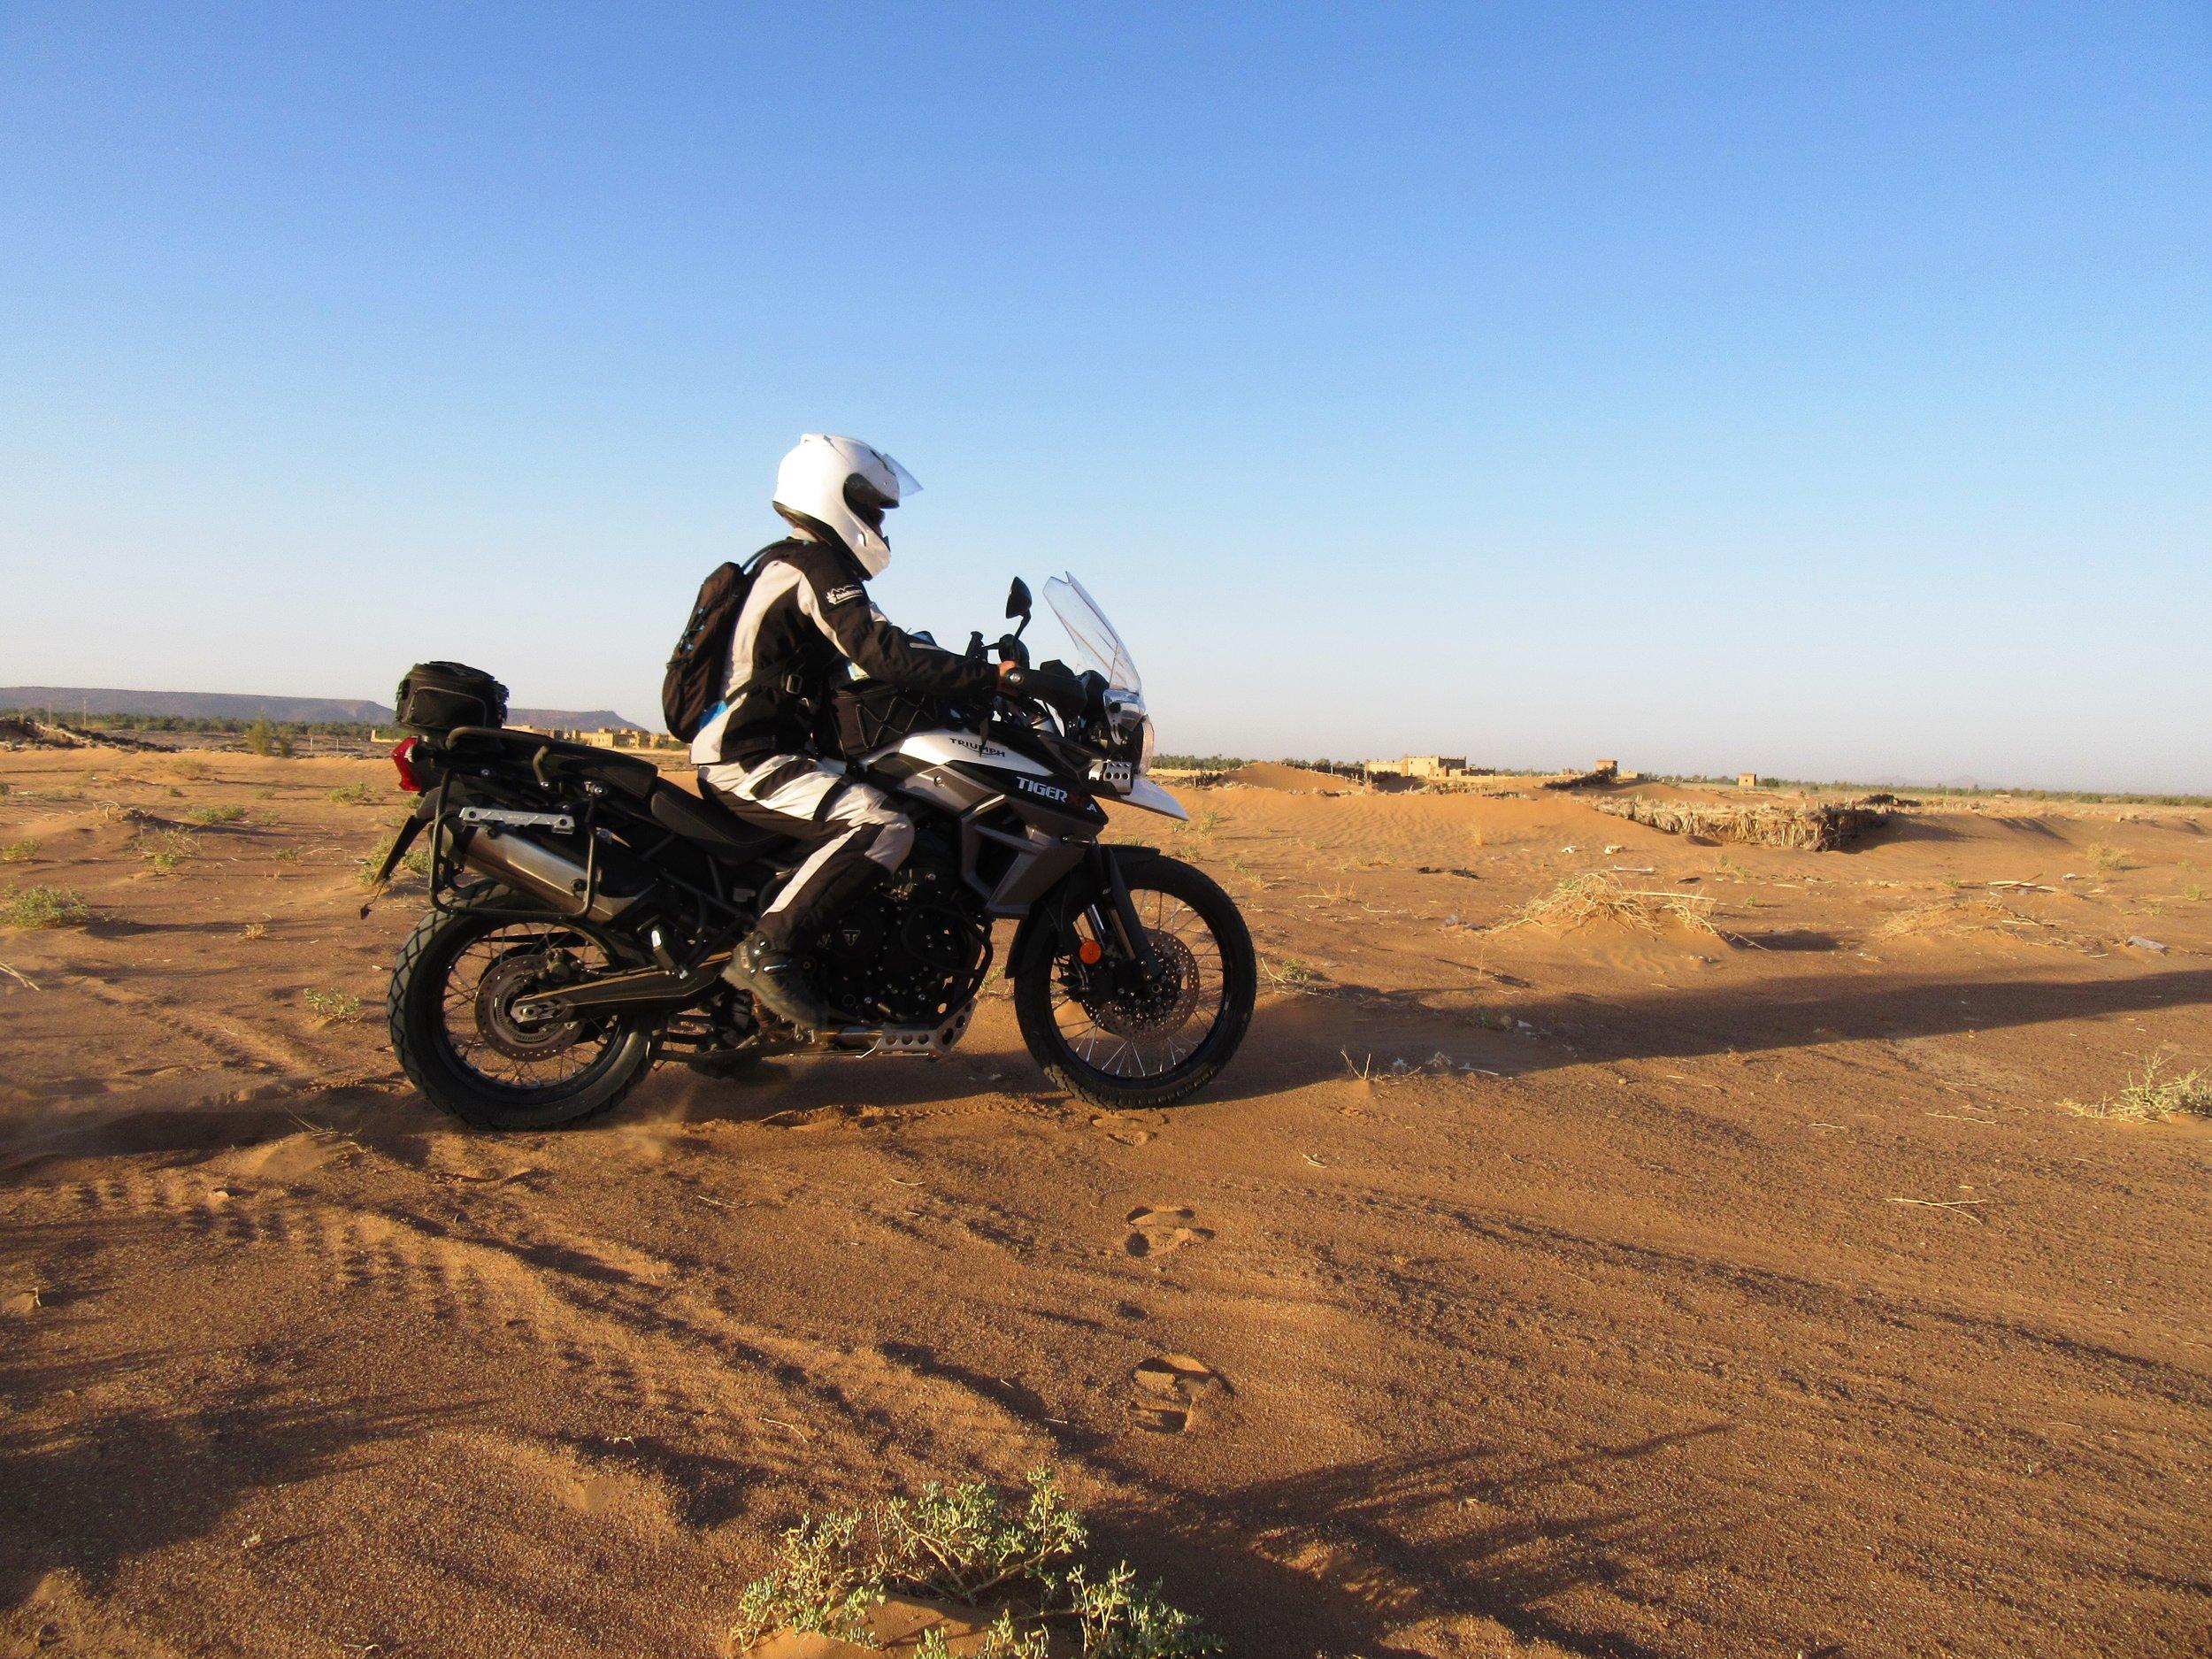 Tiffany_Coates_Adventure_Rider_Radio-Motorcycle_Podcast_8.JPG